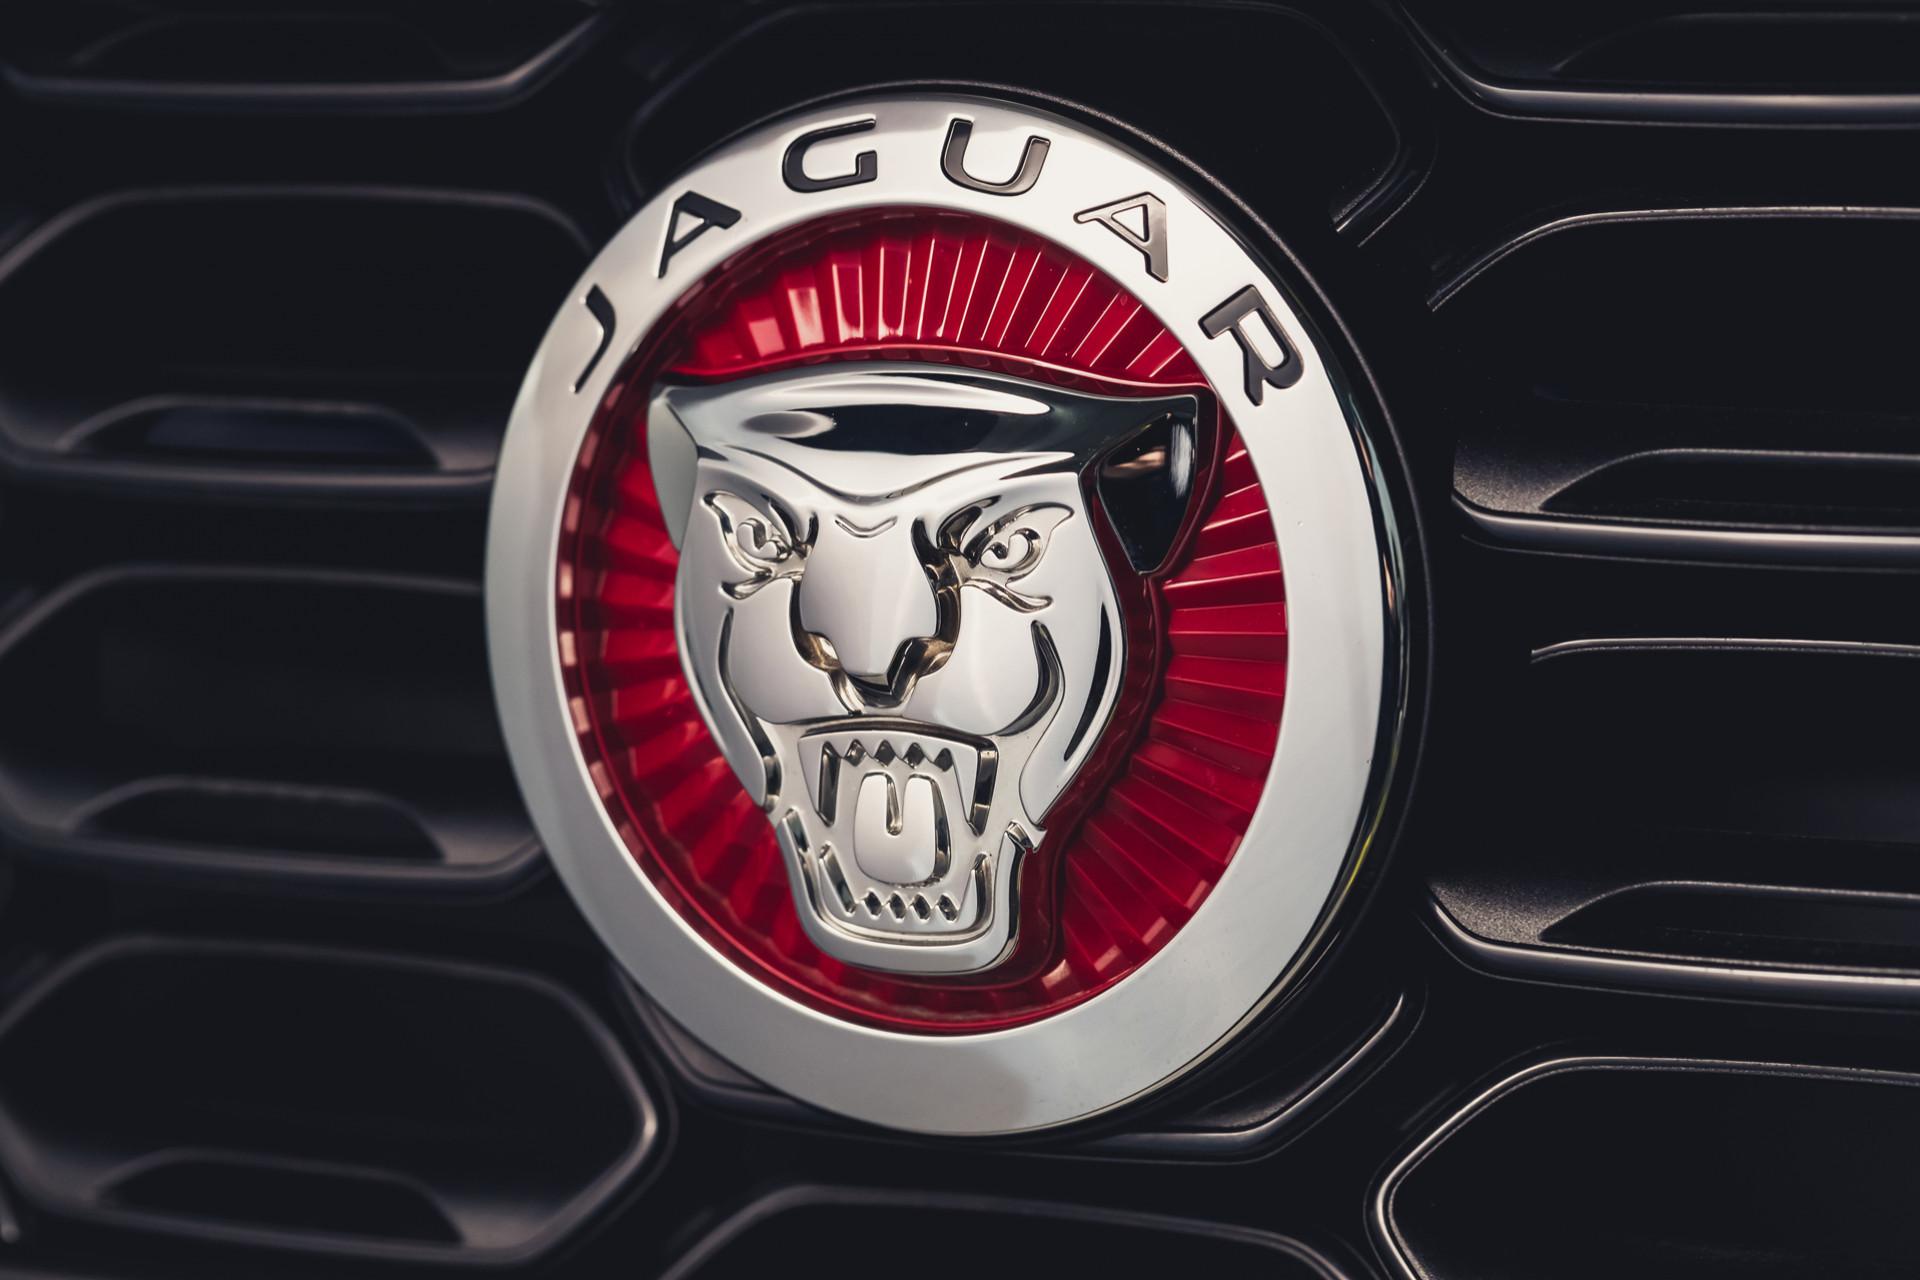 Jaguar F-TYPE P300 Coupé RWD in Eiger Grey